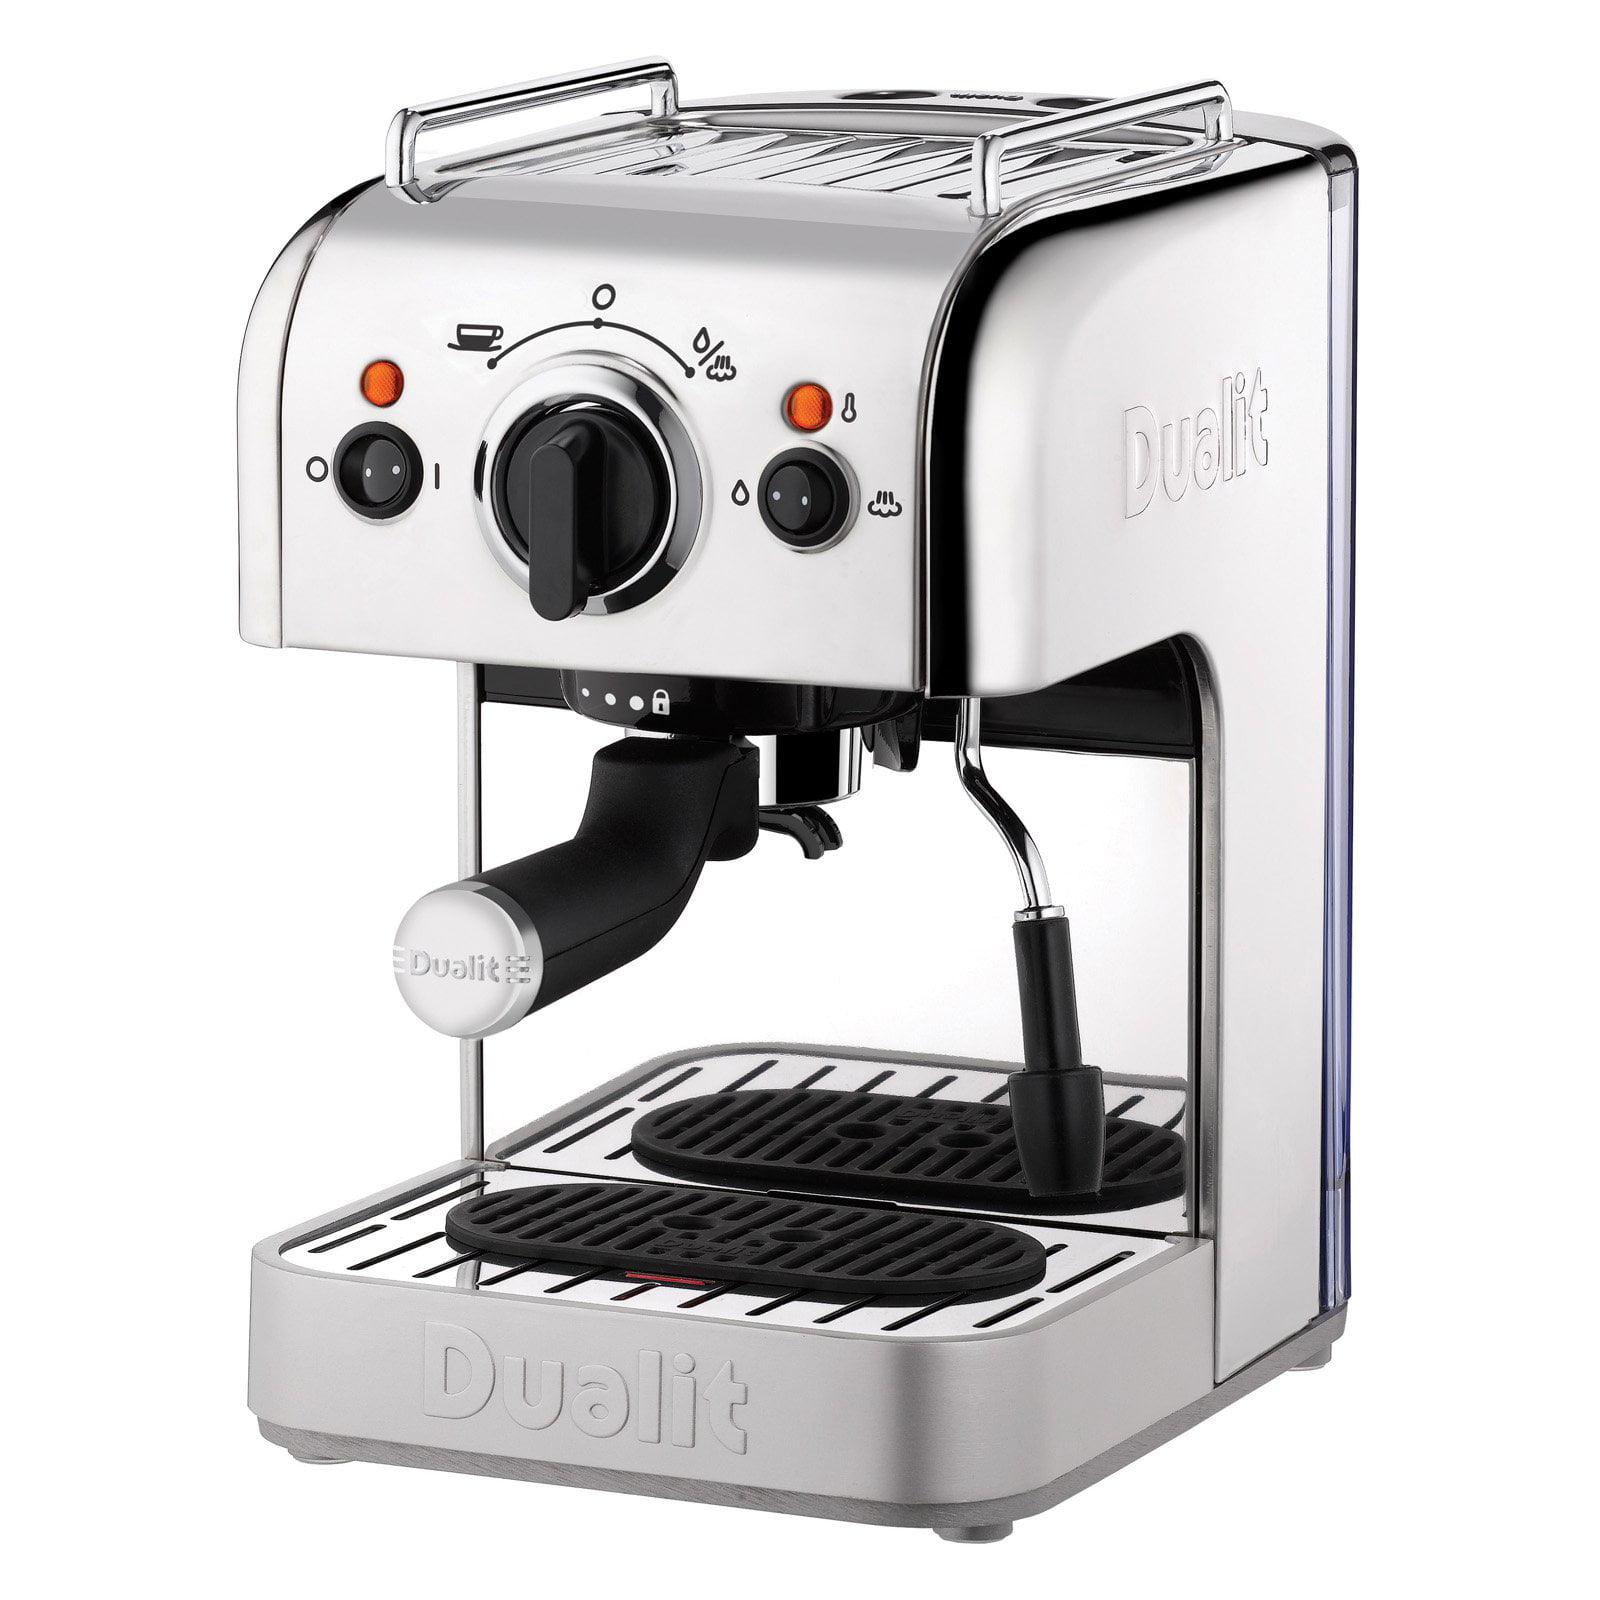 Dualit 84460 4-in-1 Espresso Machine with bonus NX adapter Polished Chrome by Dualit